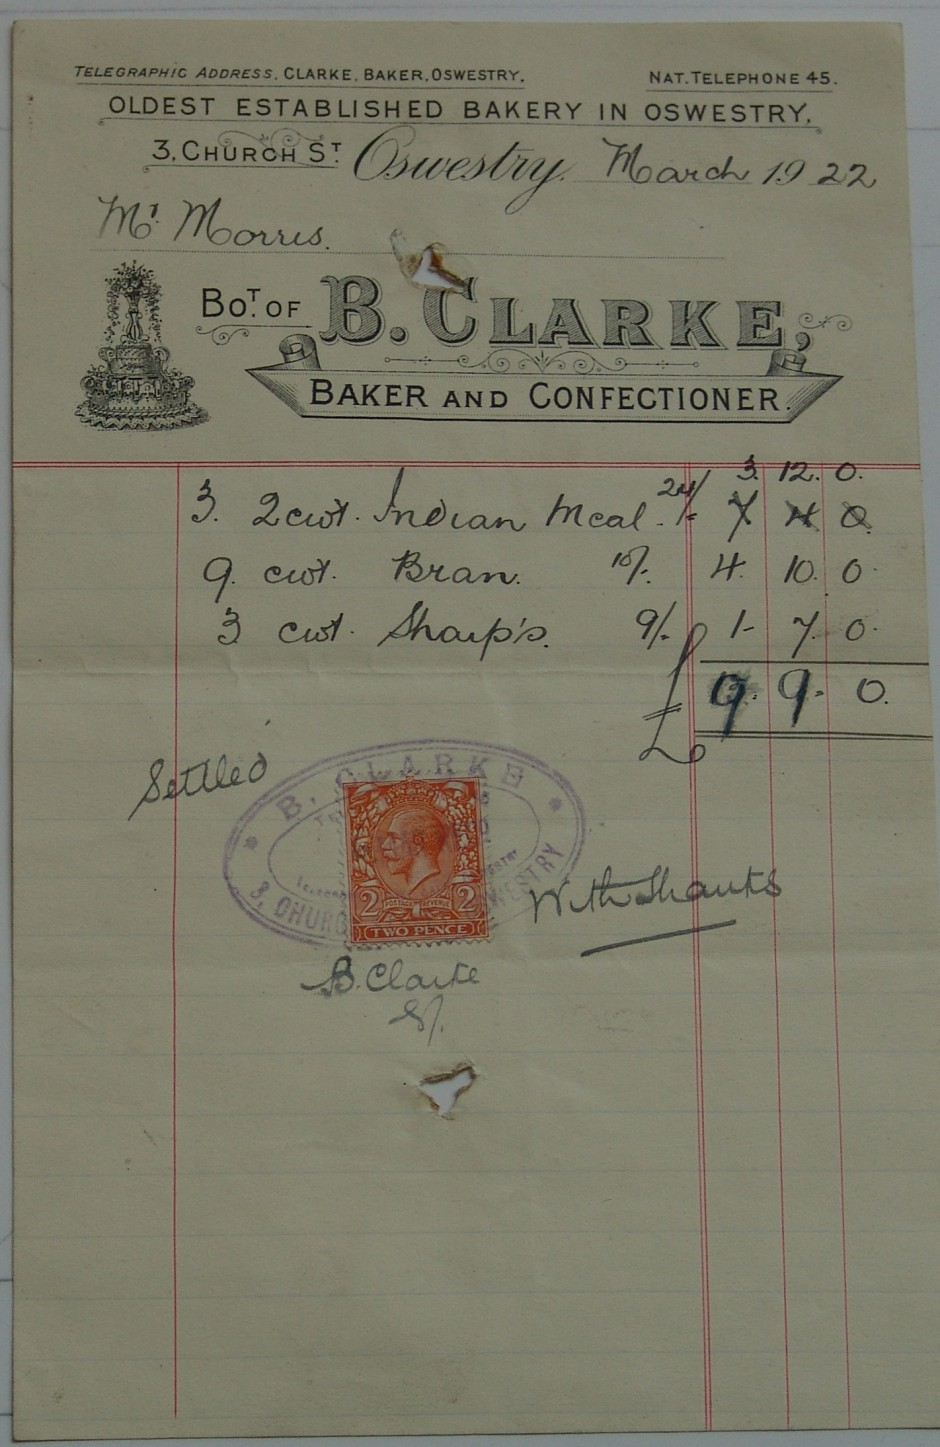 PH-O-5-6-142 - B Clarke - Baker